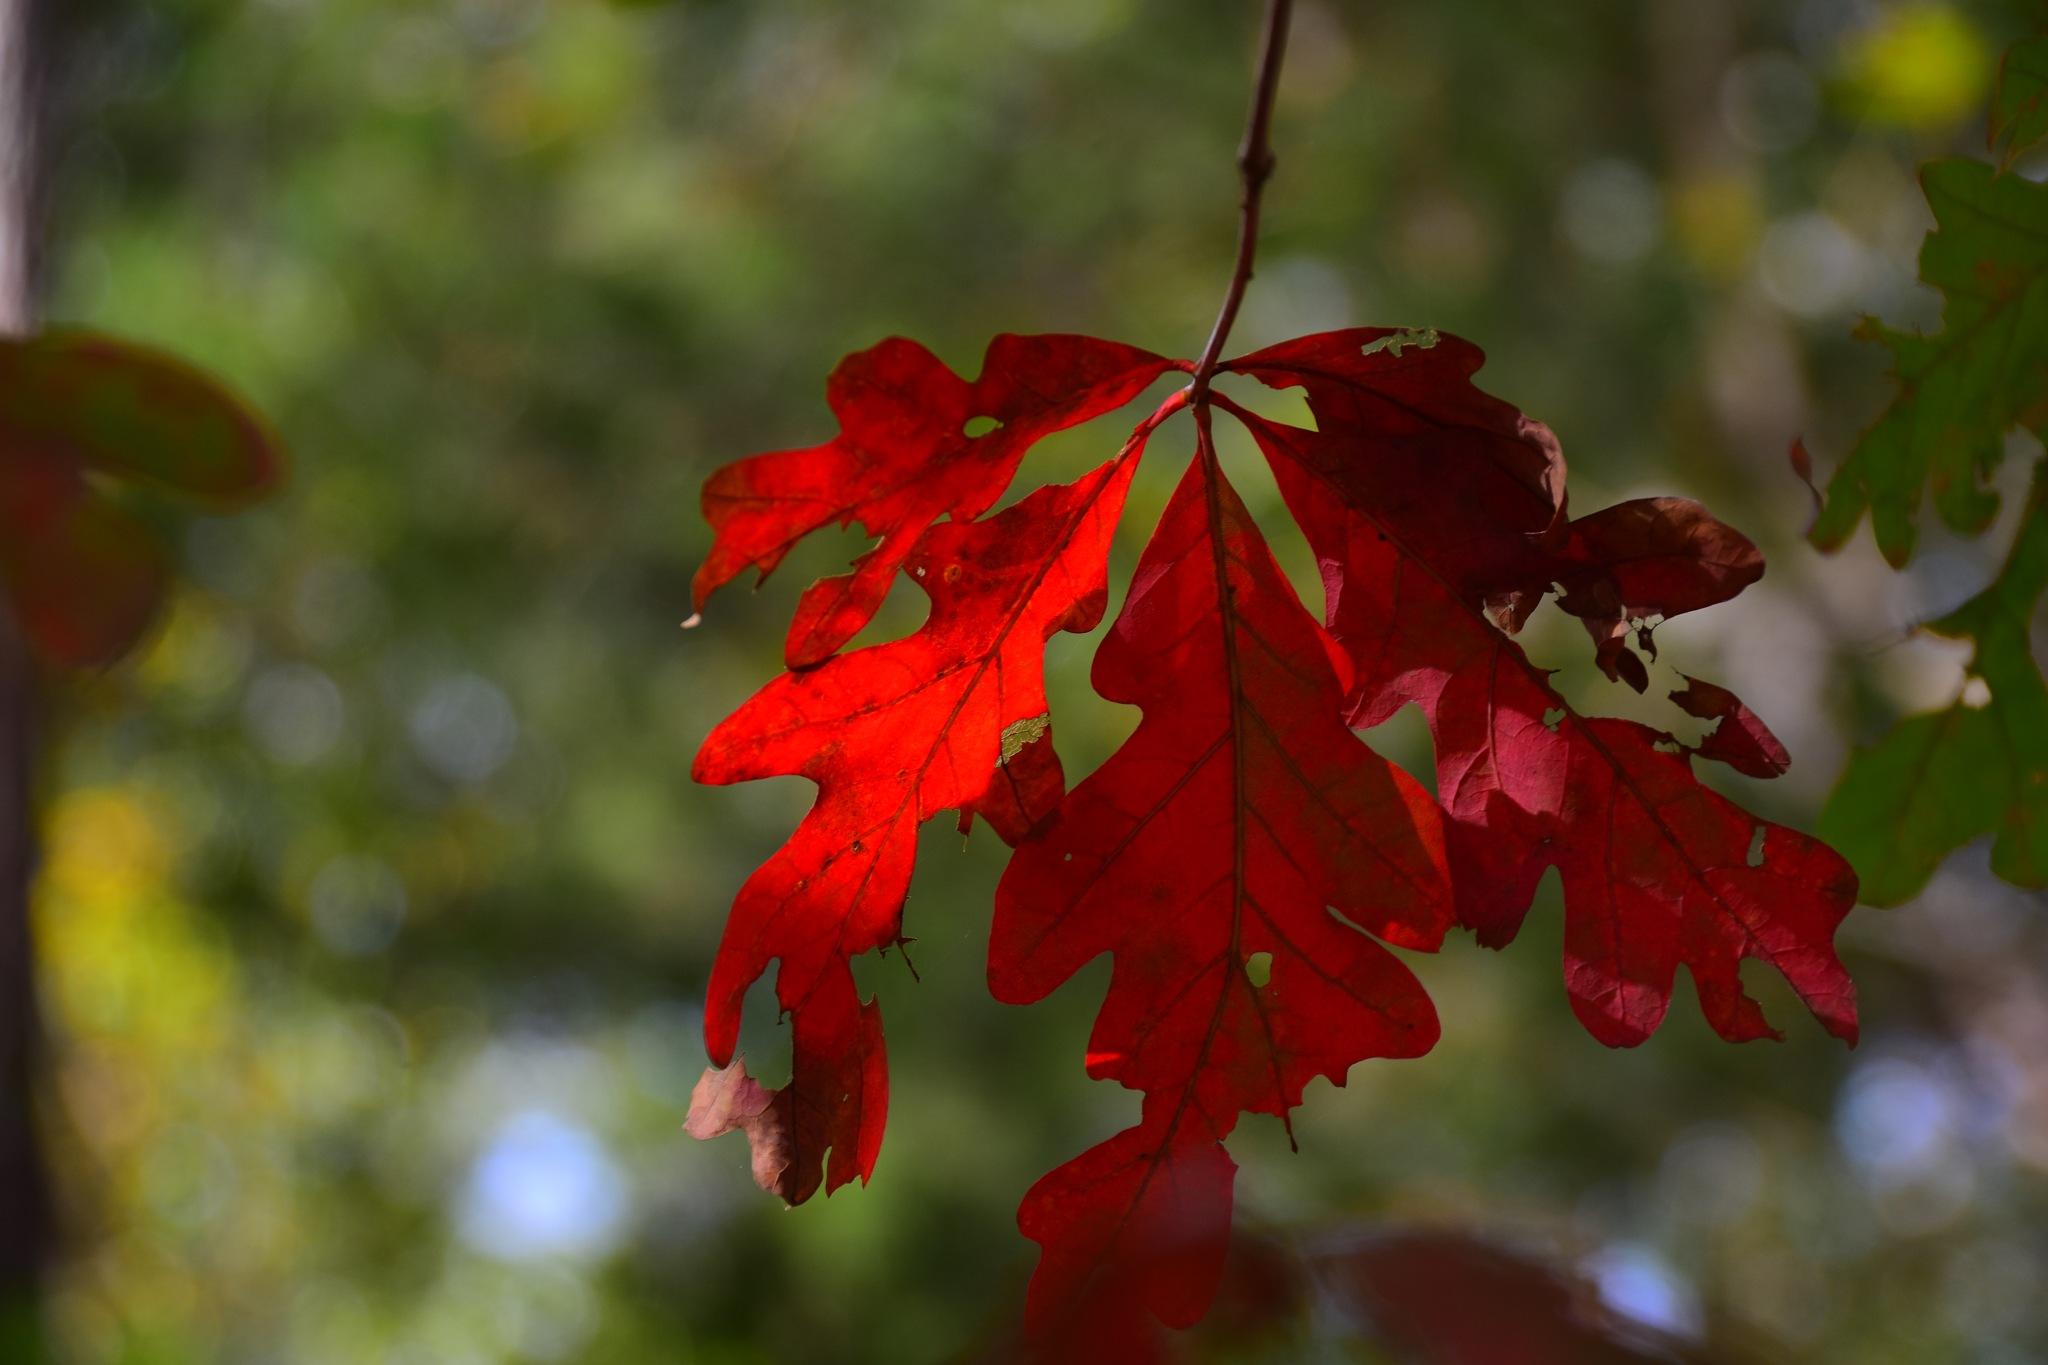 Red Leaf by Greg Knott